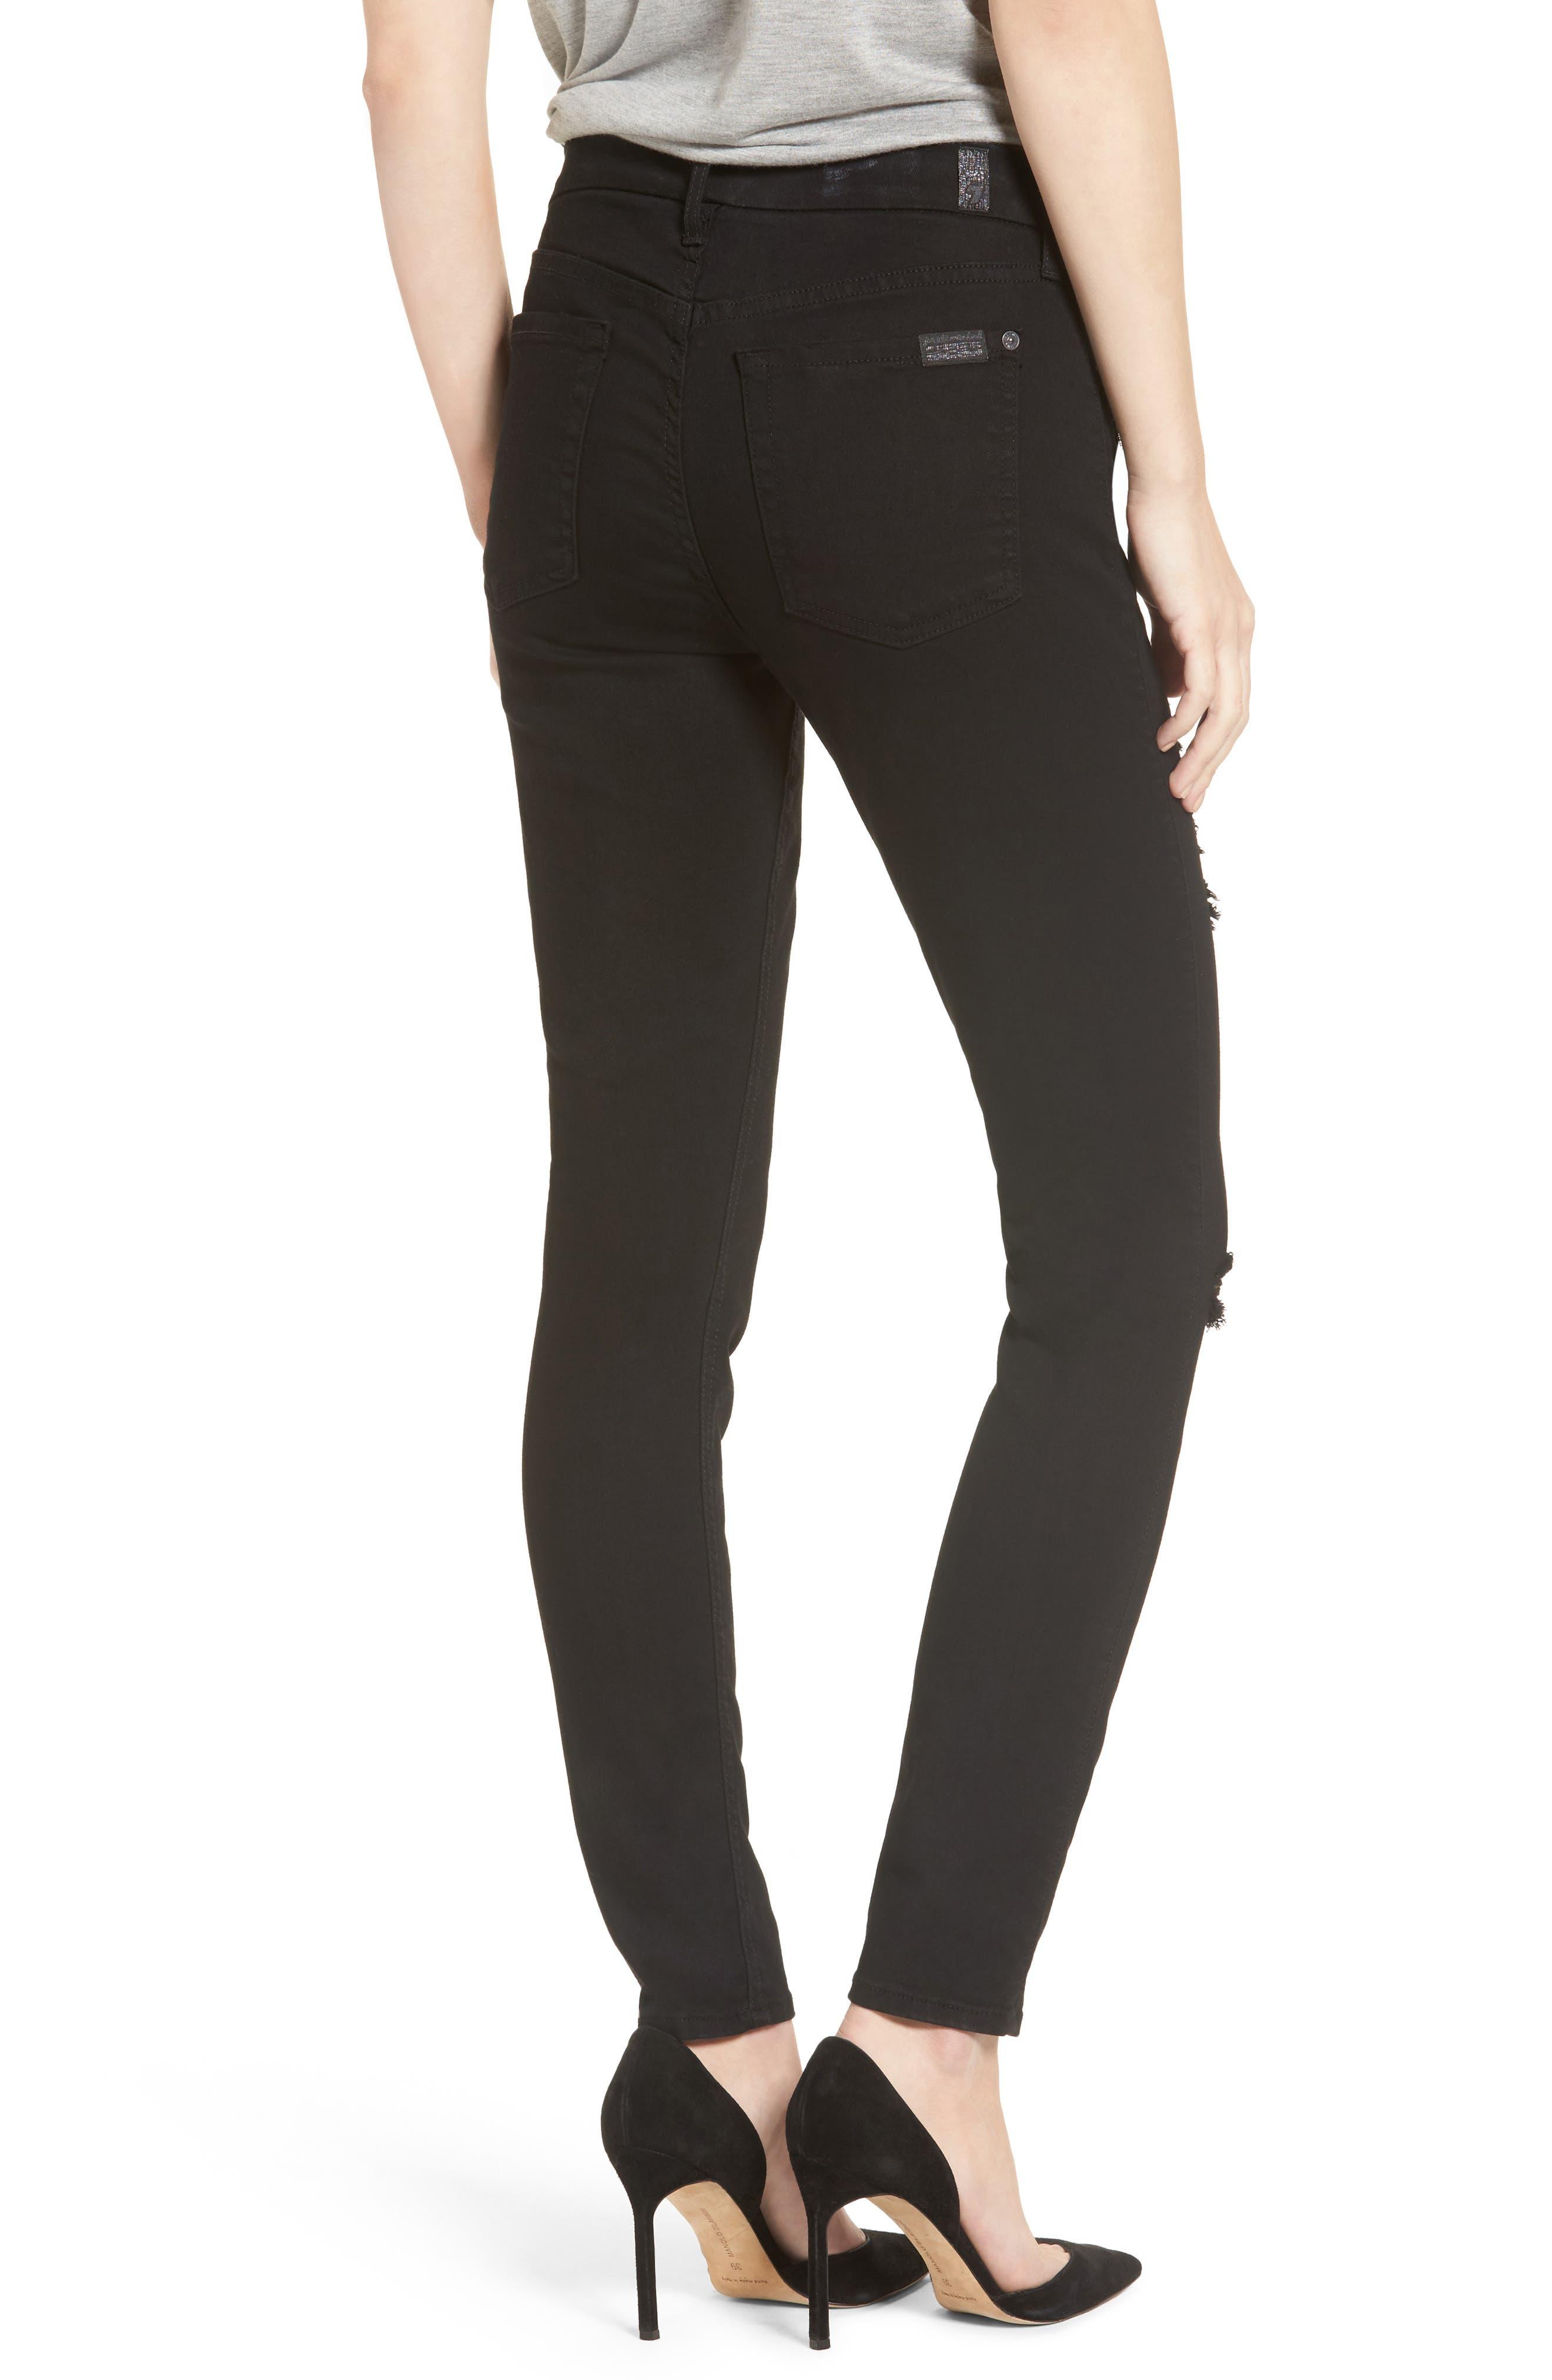 b(air) Ankle Skinny Jeans,                             Alternate thumbnail 2, color,                             BAIR BLACK 3